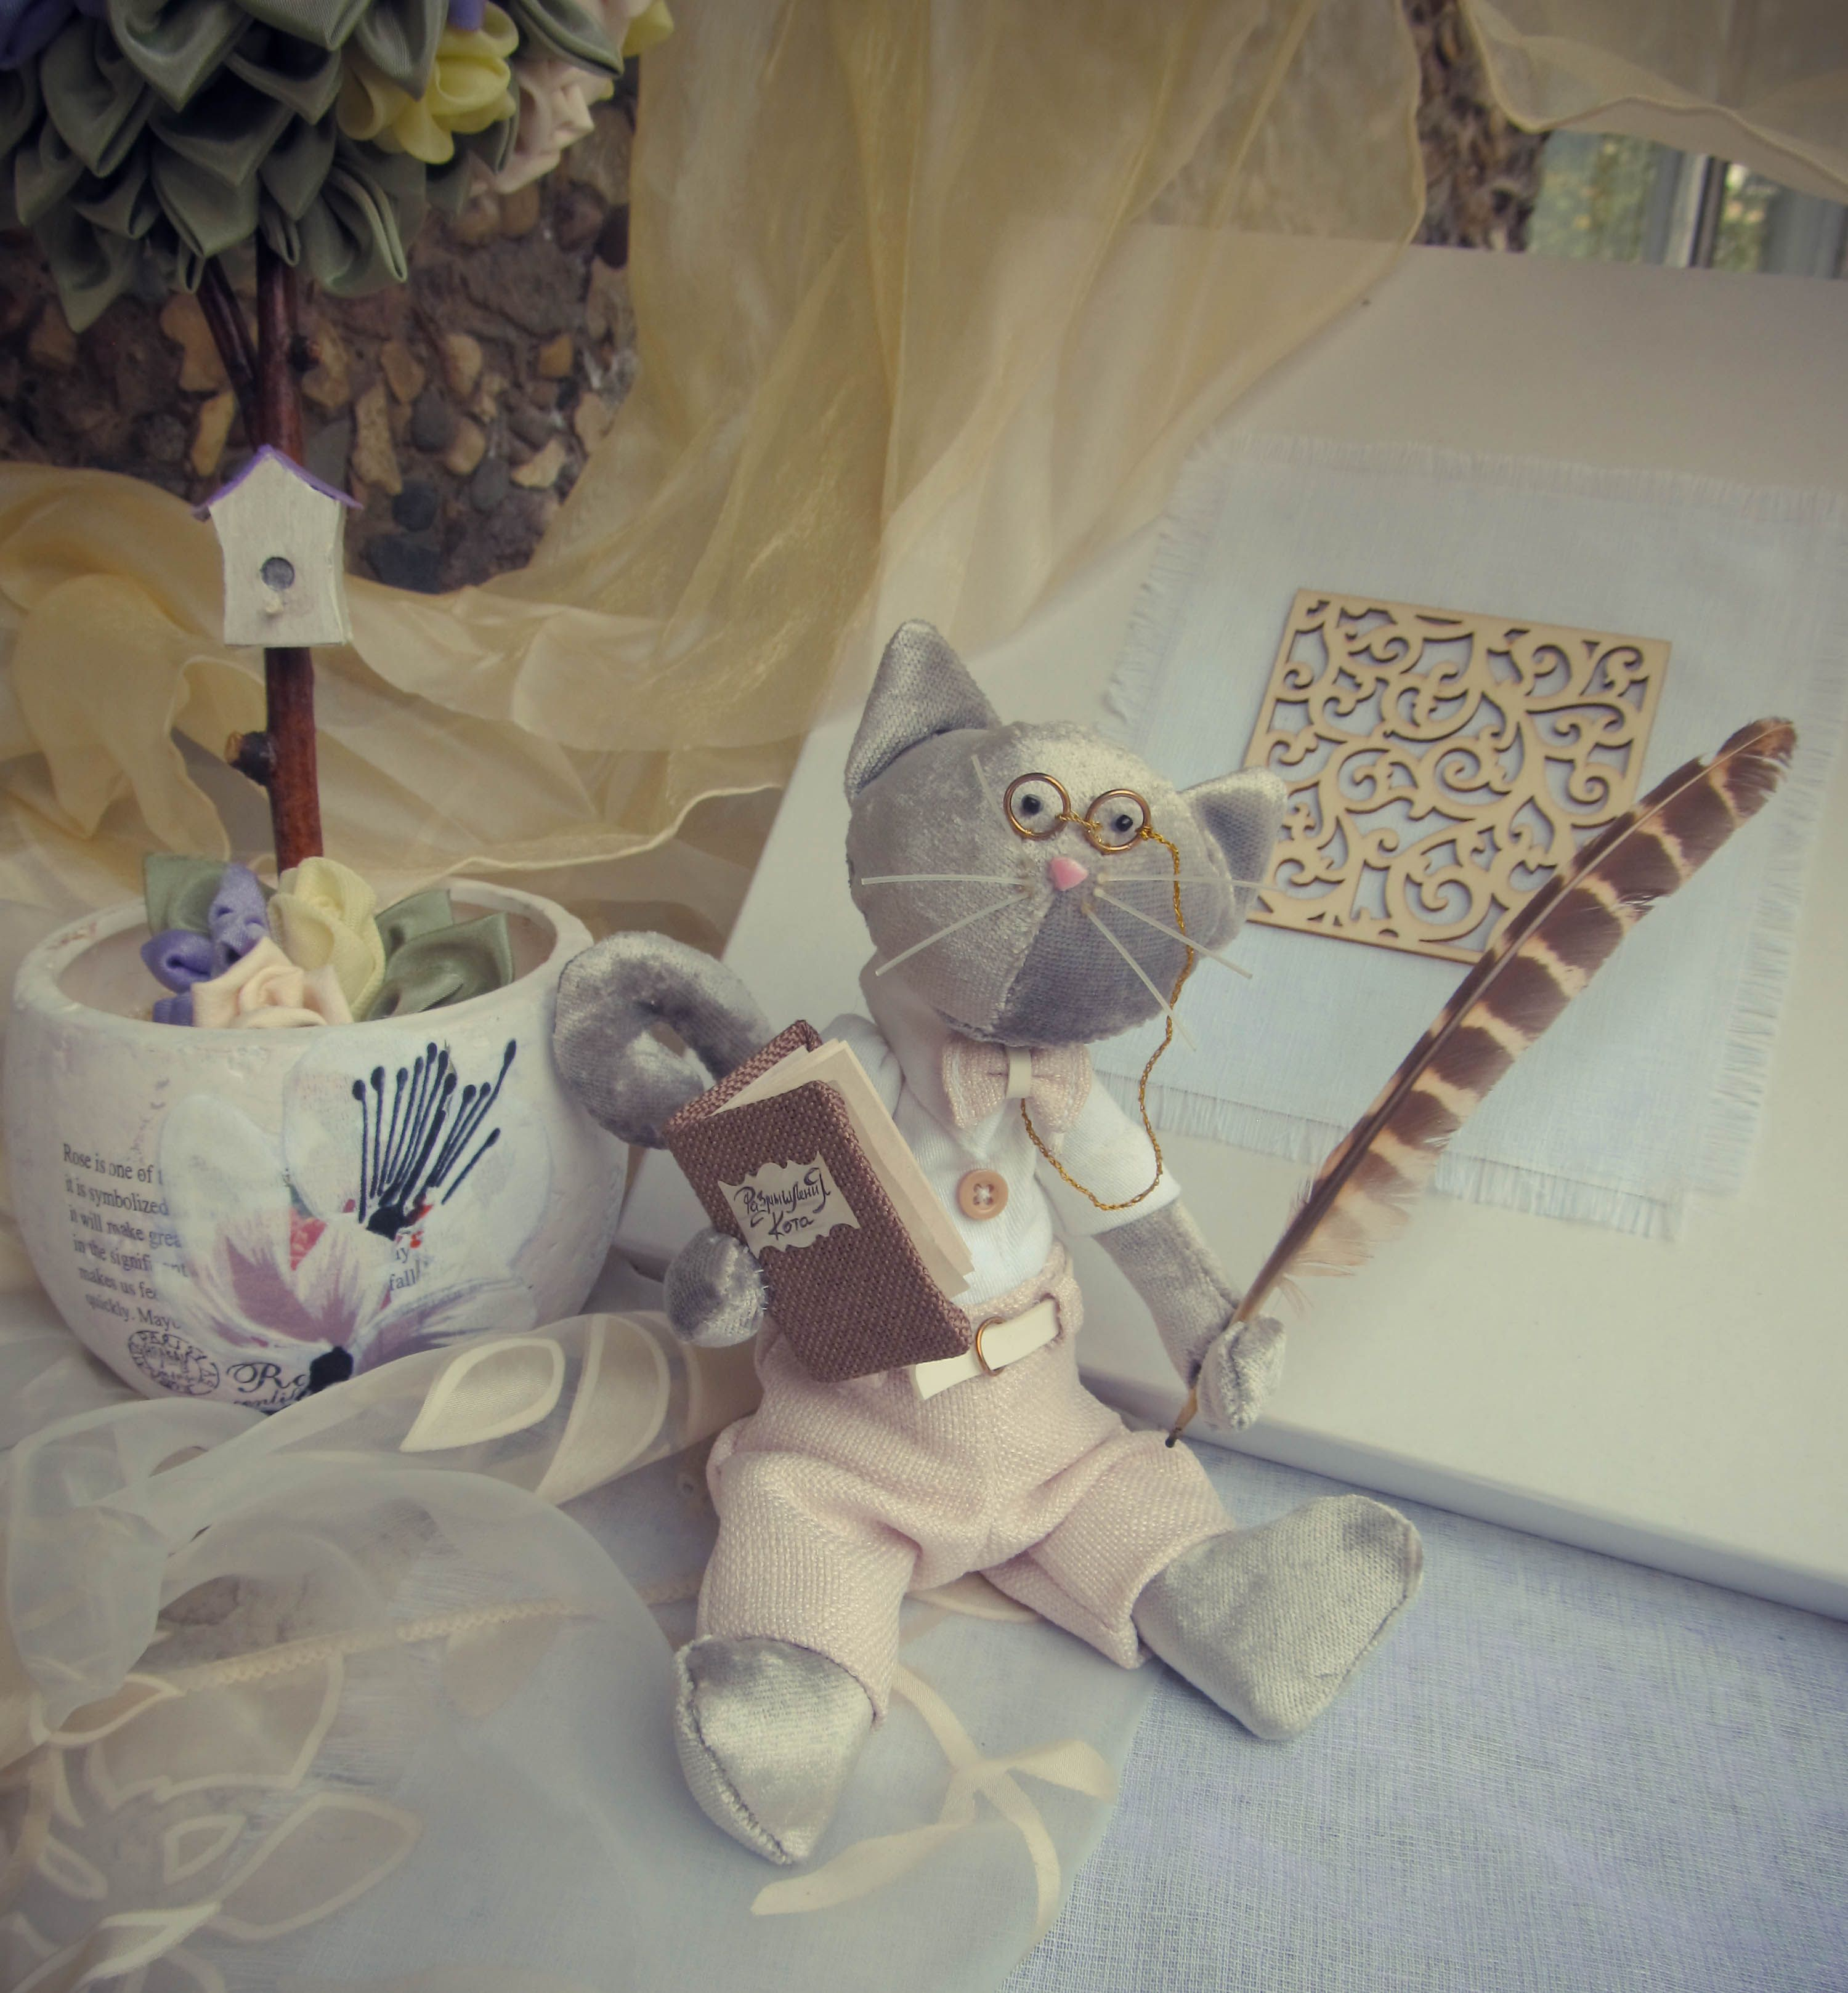 стихи поэзия лукоморье пушкин знание игрушка кукла декор интерьер тильда классика кот ученый просвещение ум